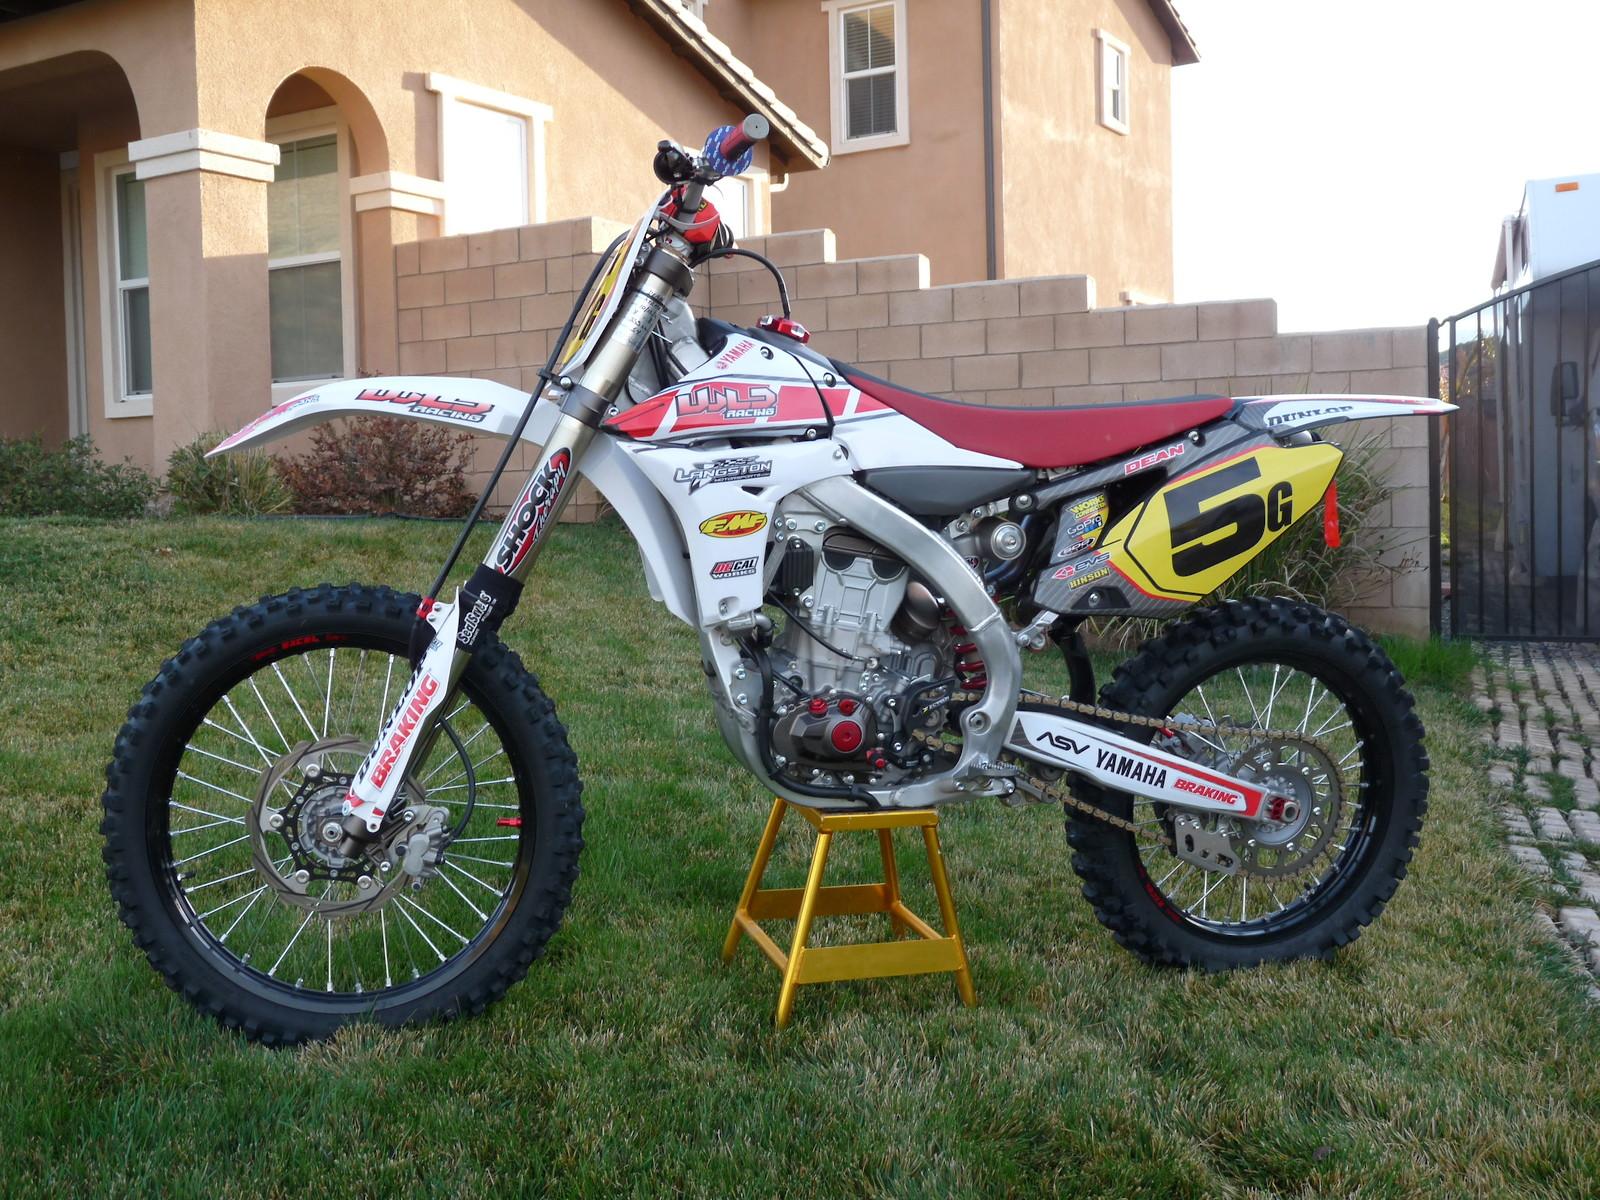 P1230524 - WLD - Motocross Pictures - Vital MX